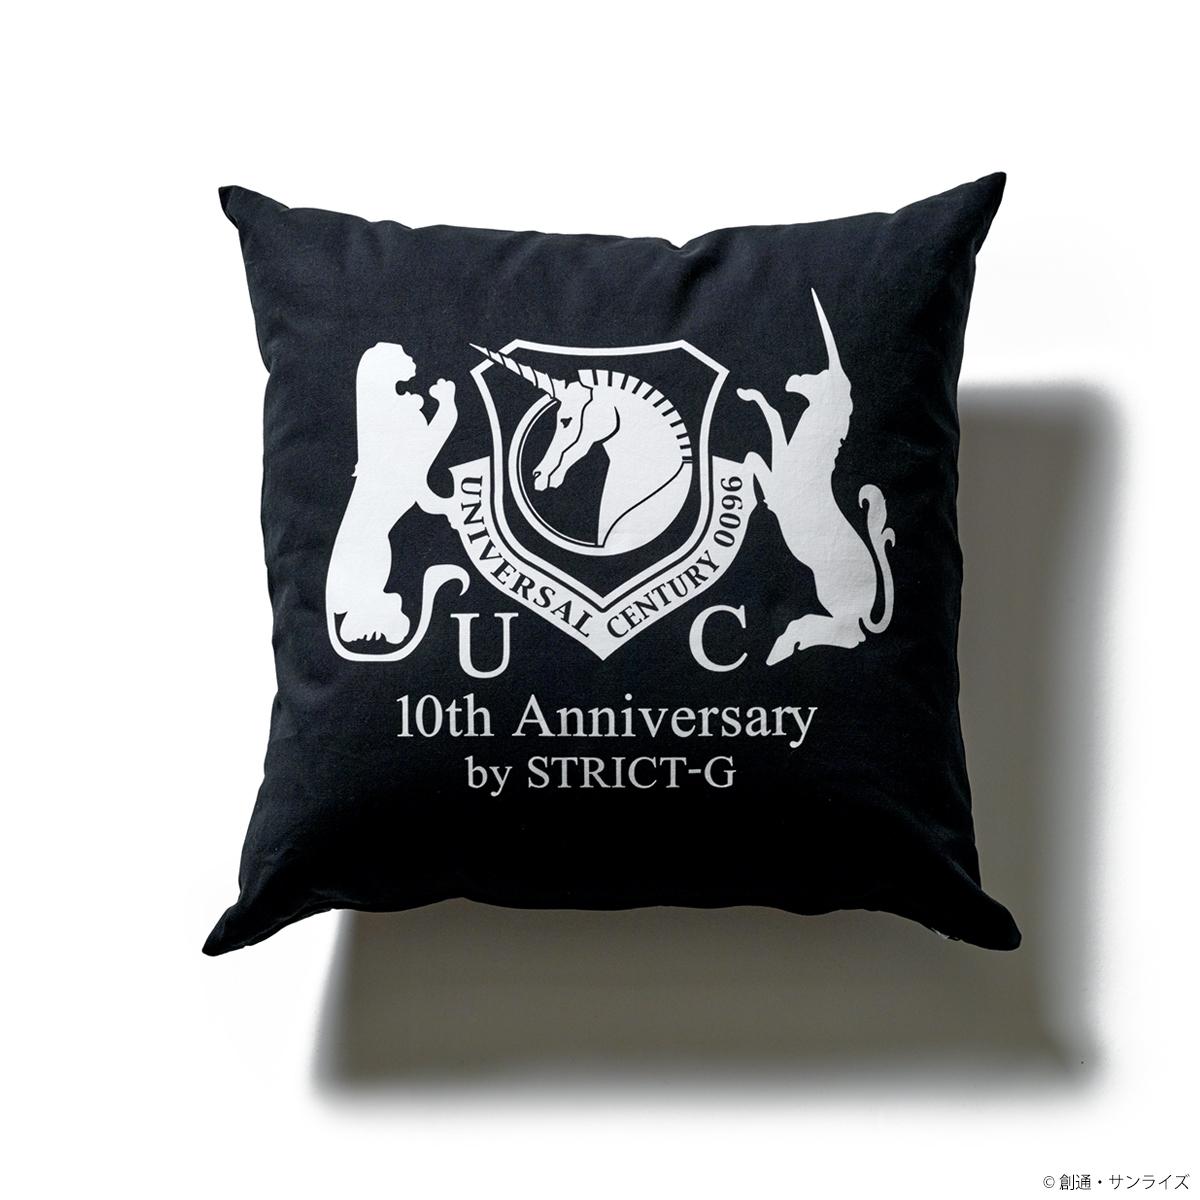 STRICT-G『機動戦士ガンダムUC』OVA10周年記念 クッション タペストリー柄